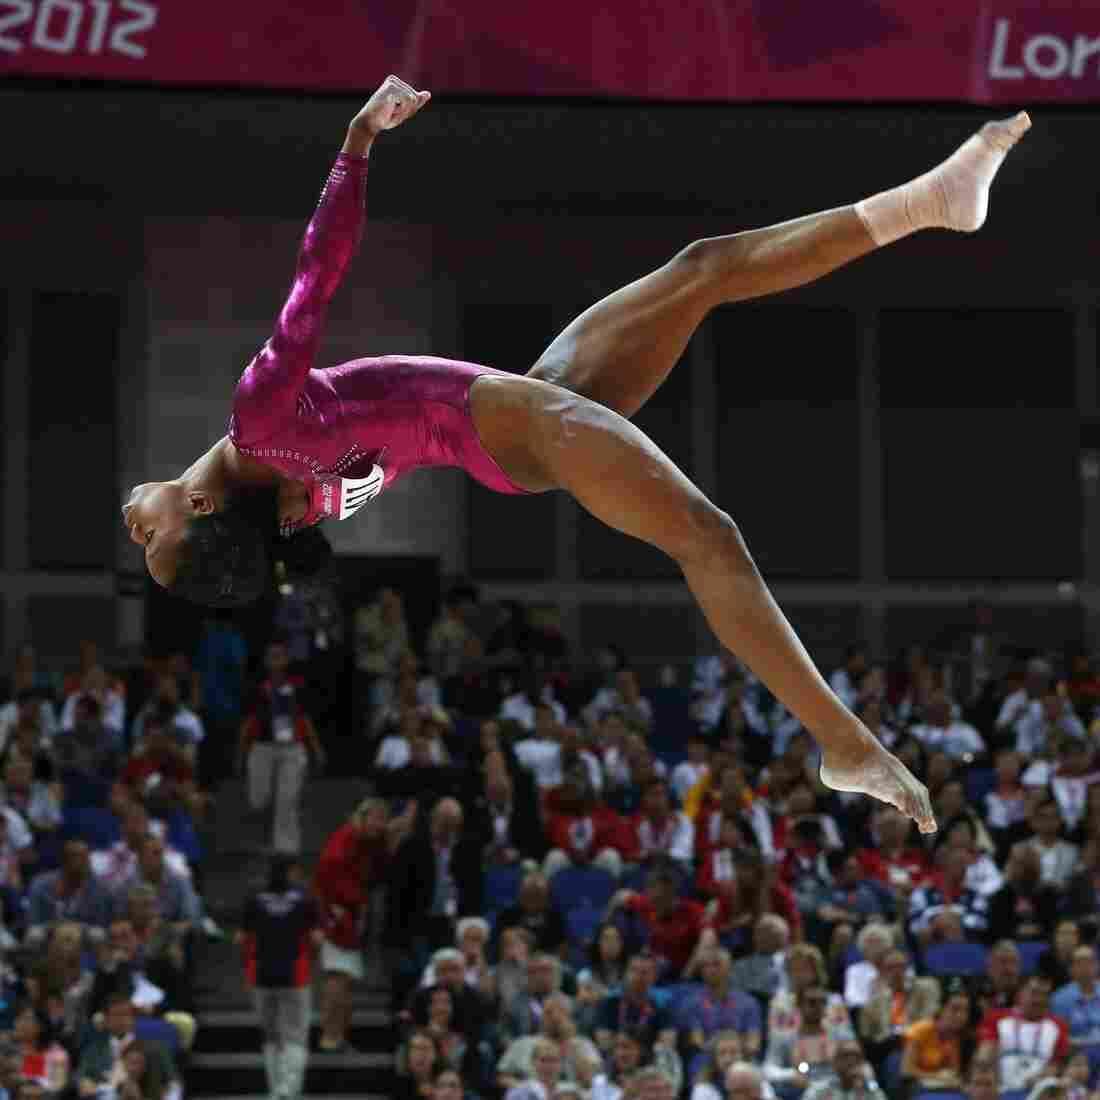 U.S. Gymnast Douglas Wins Gold In Individual All-Around